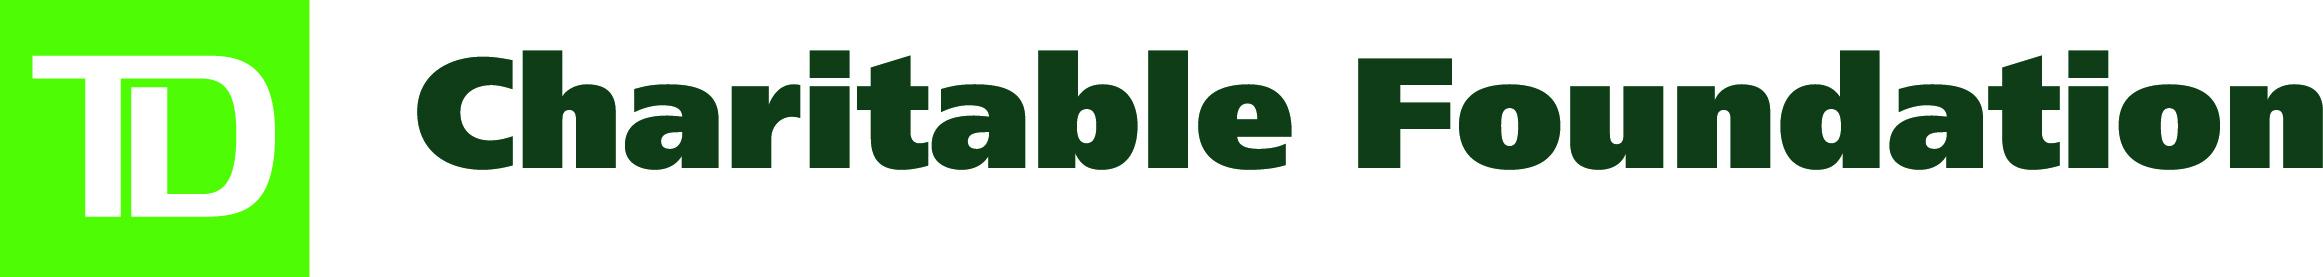 TD_CharitableFoundation_c